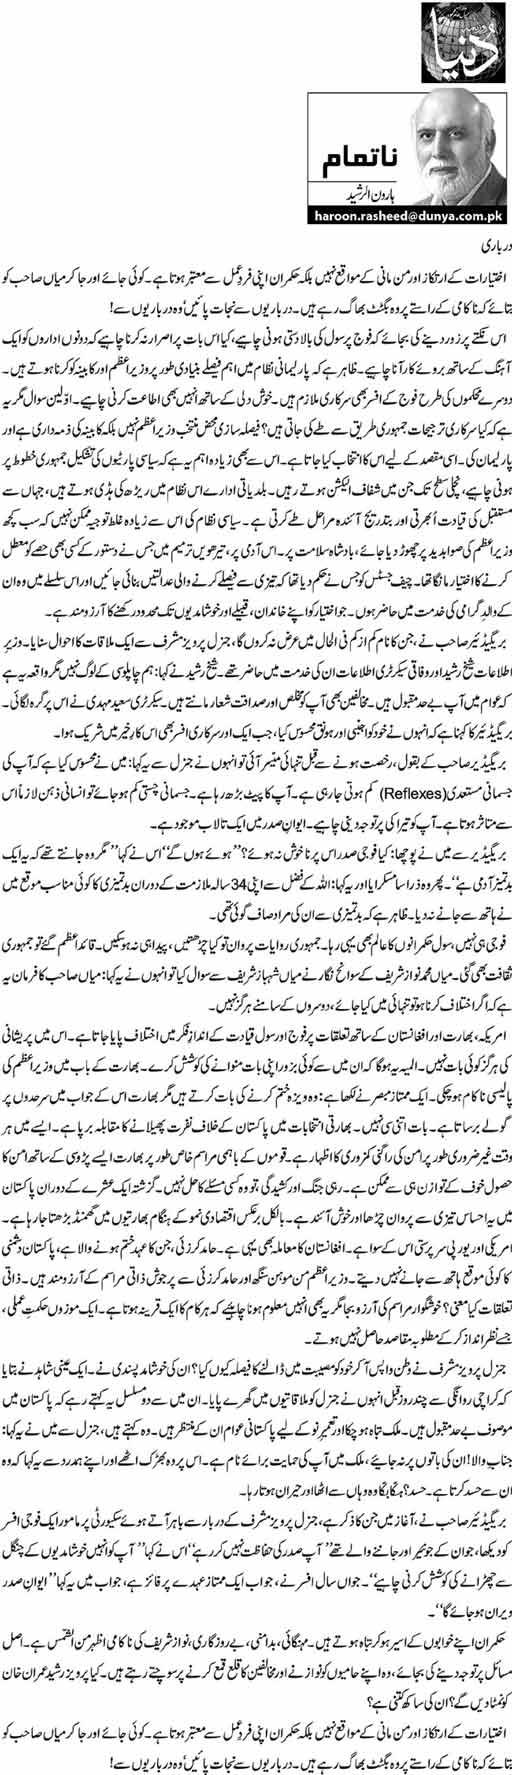 Darbari - Haroon-ur-Rasheed